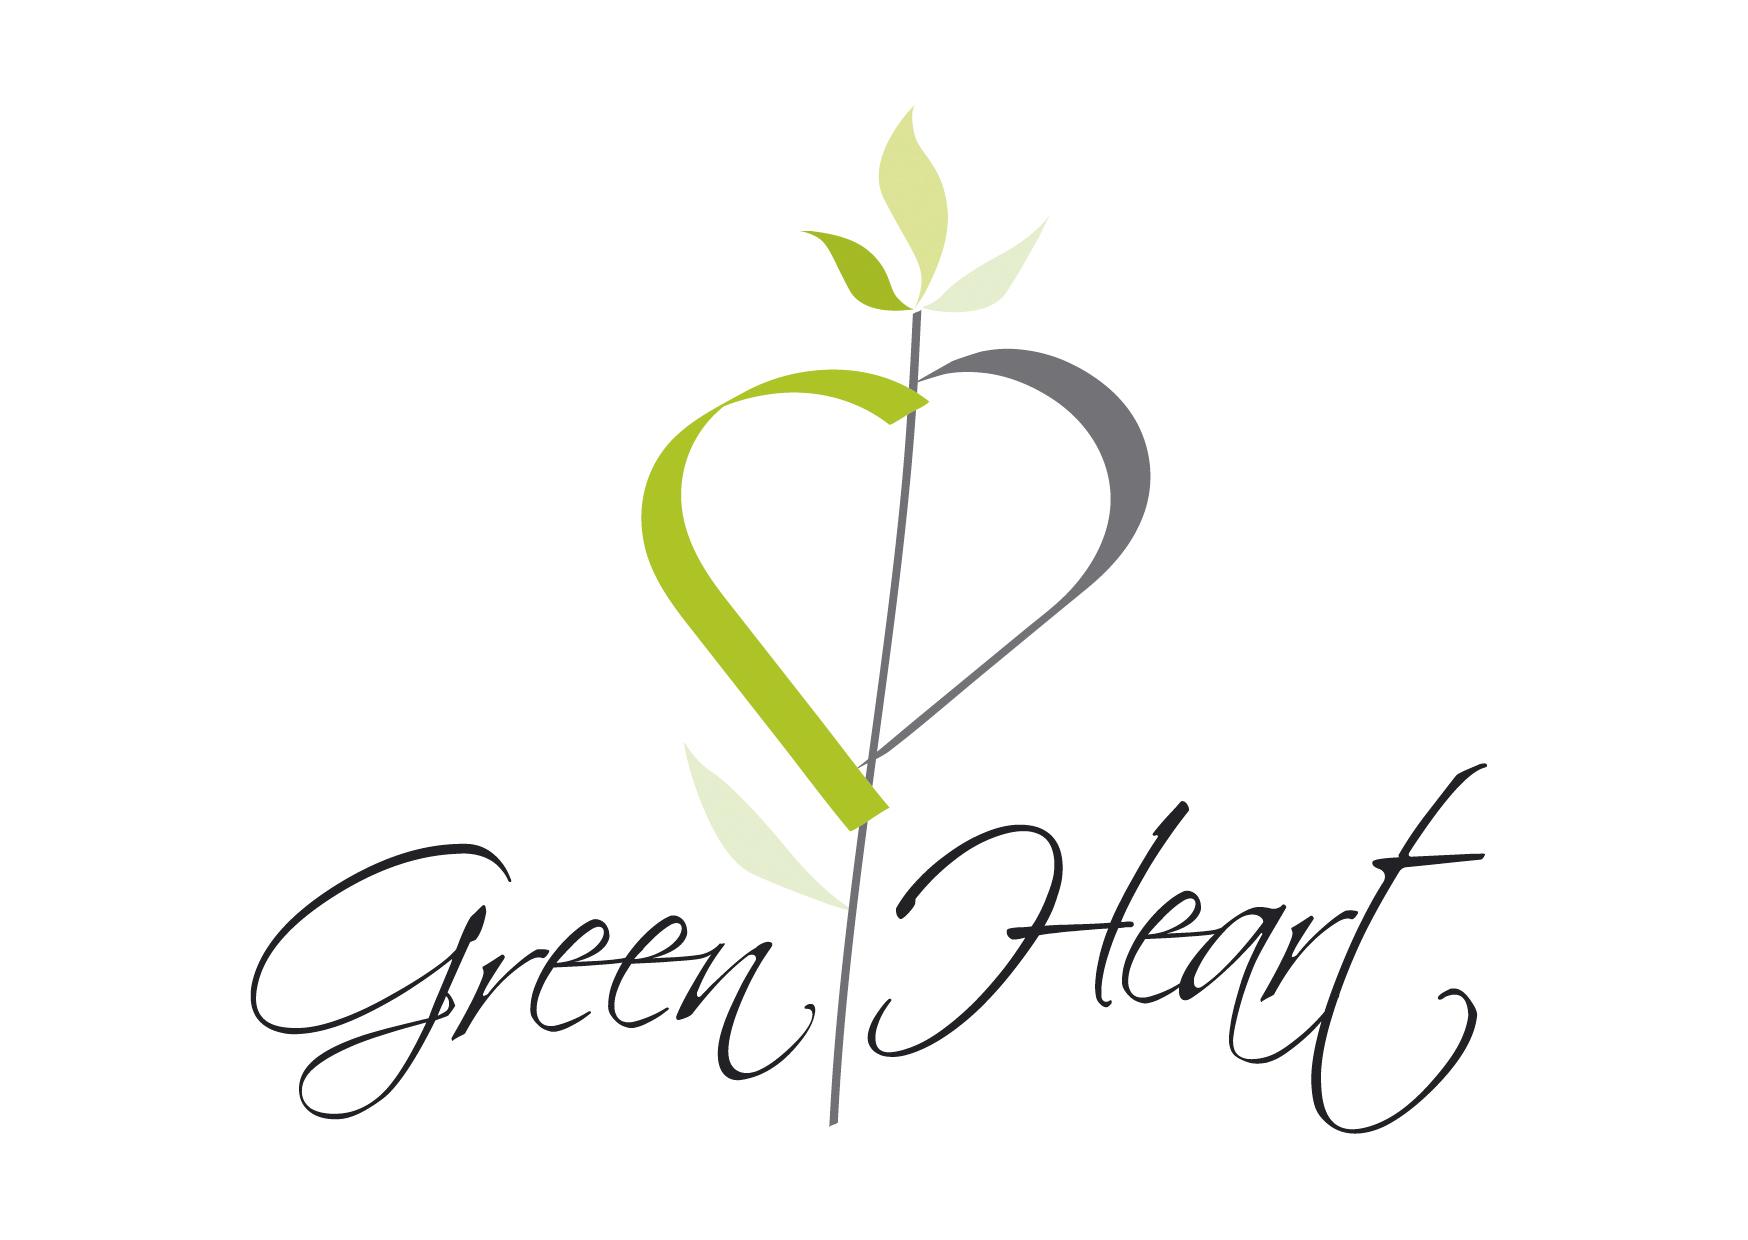 Návrh designu loga GREEN HEART Kutná Hora